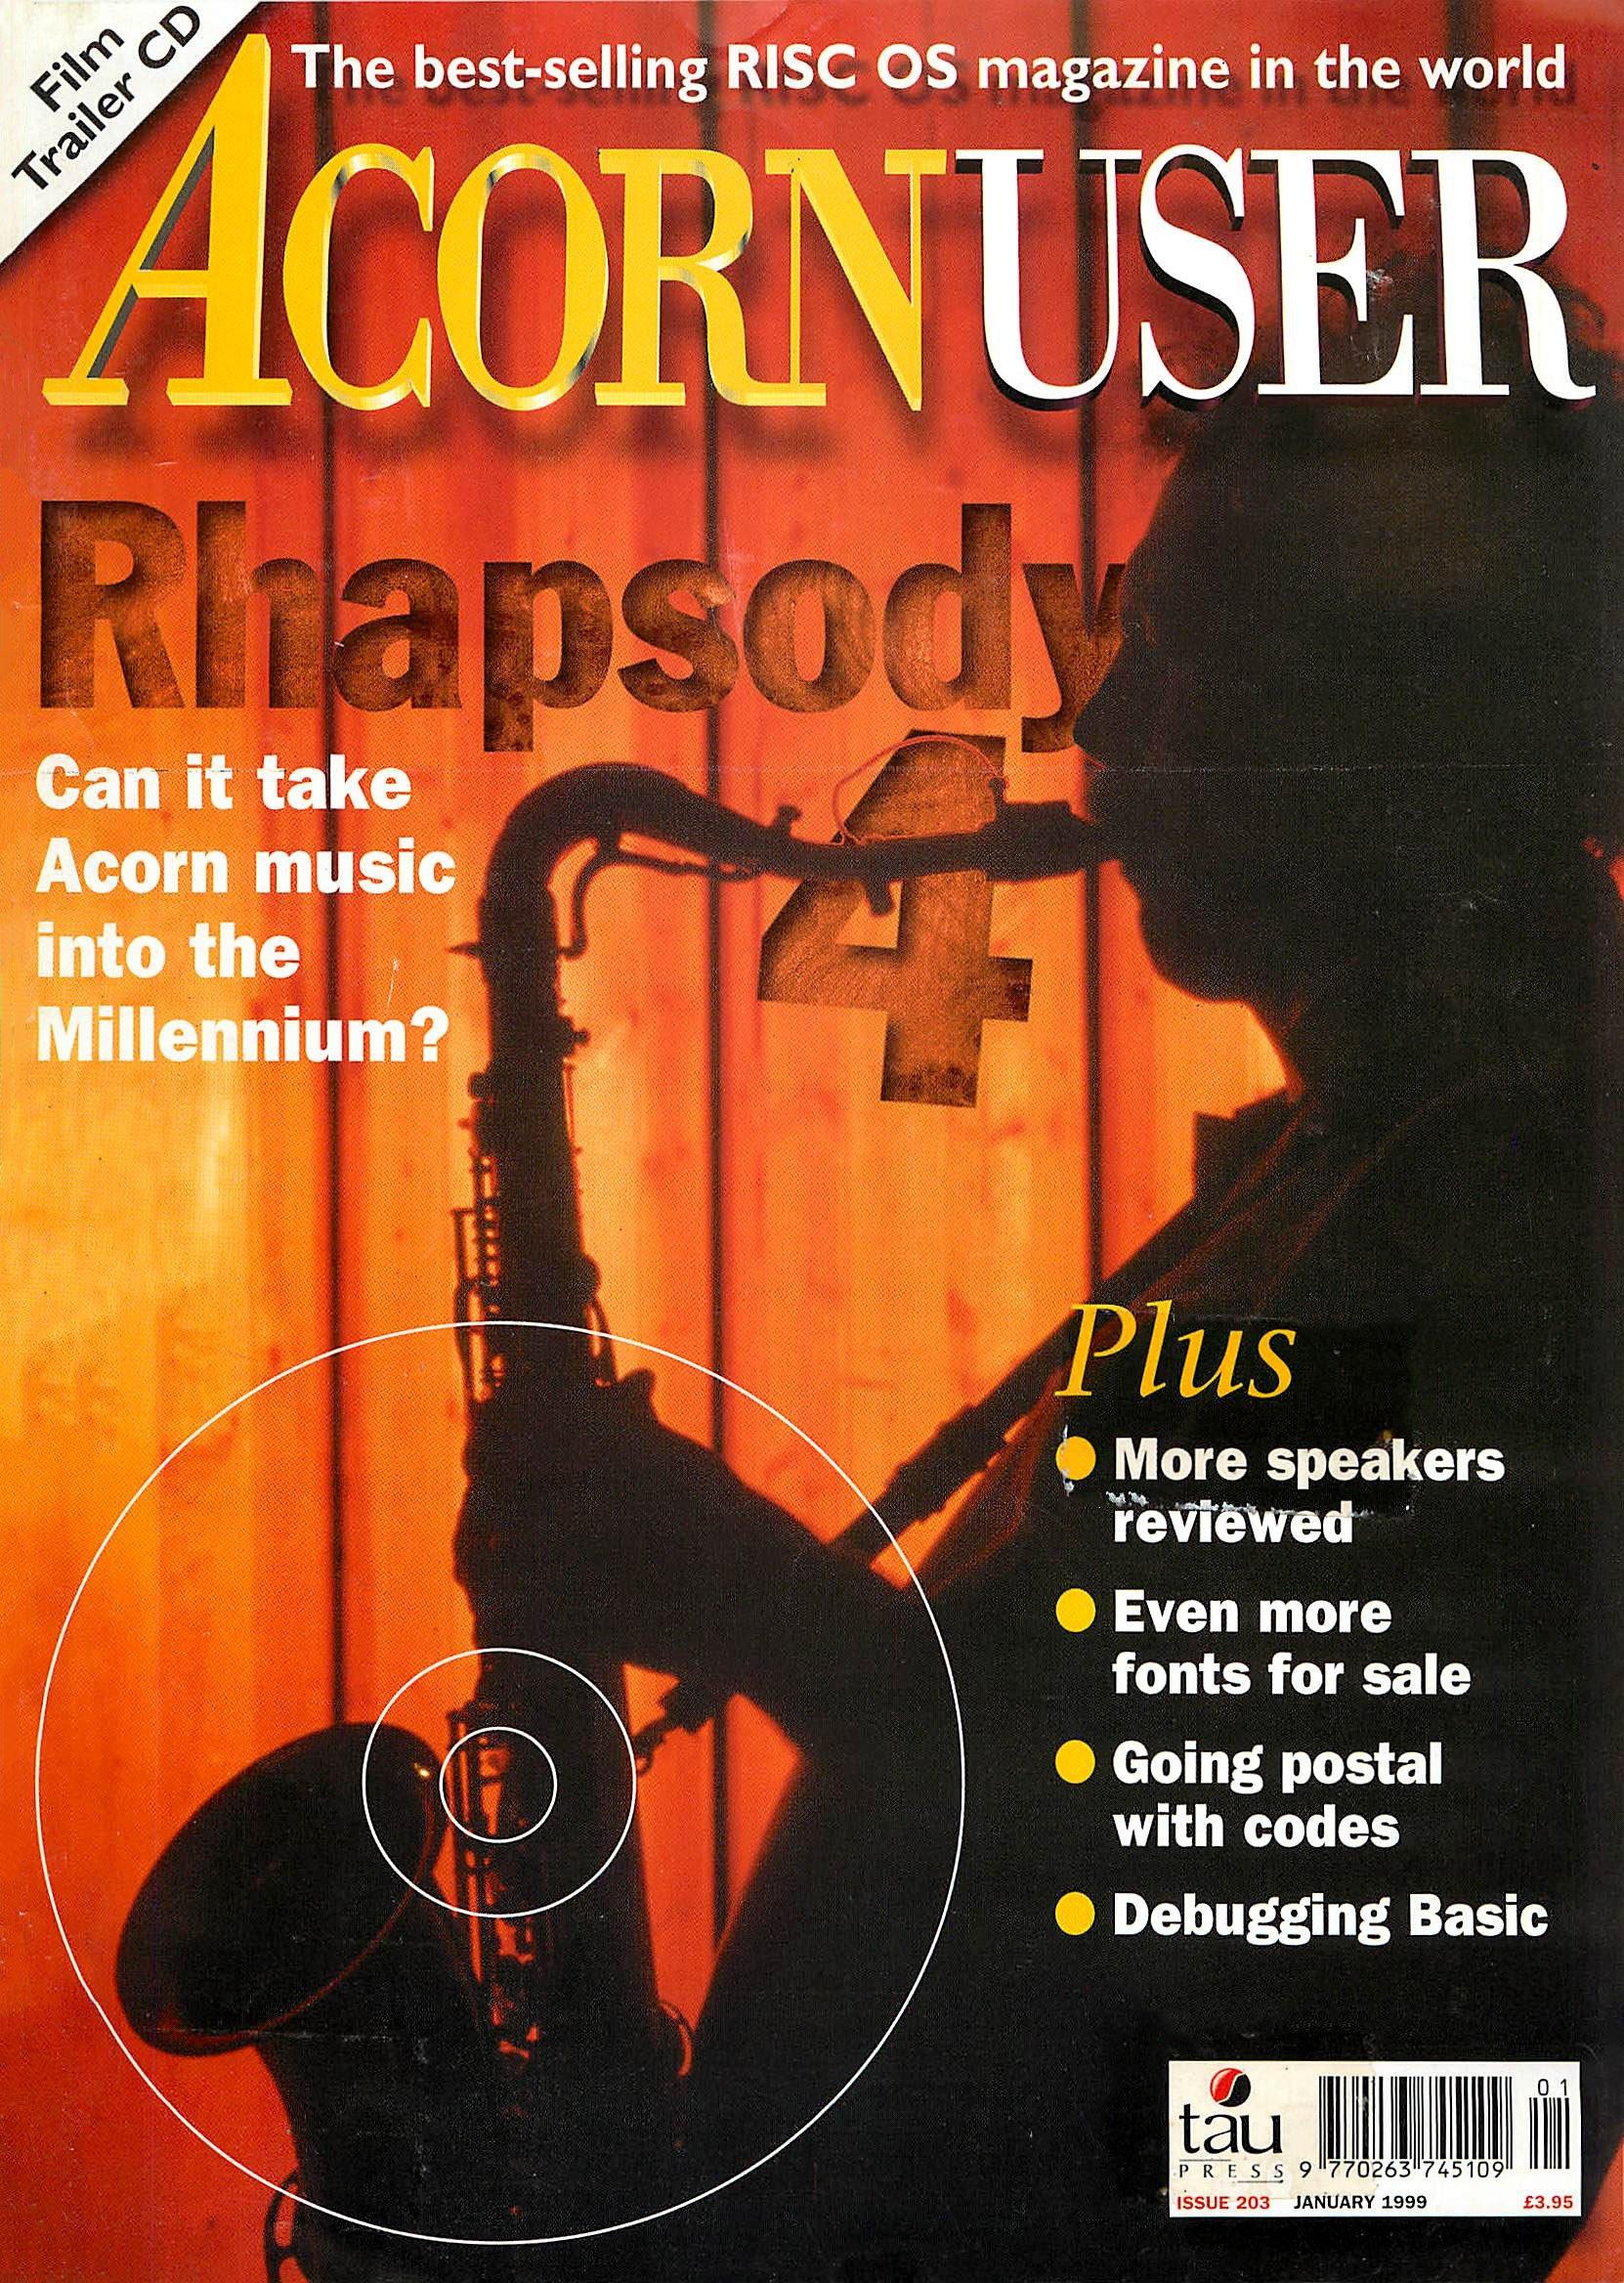 Acorn User 203 (January 1999)